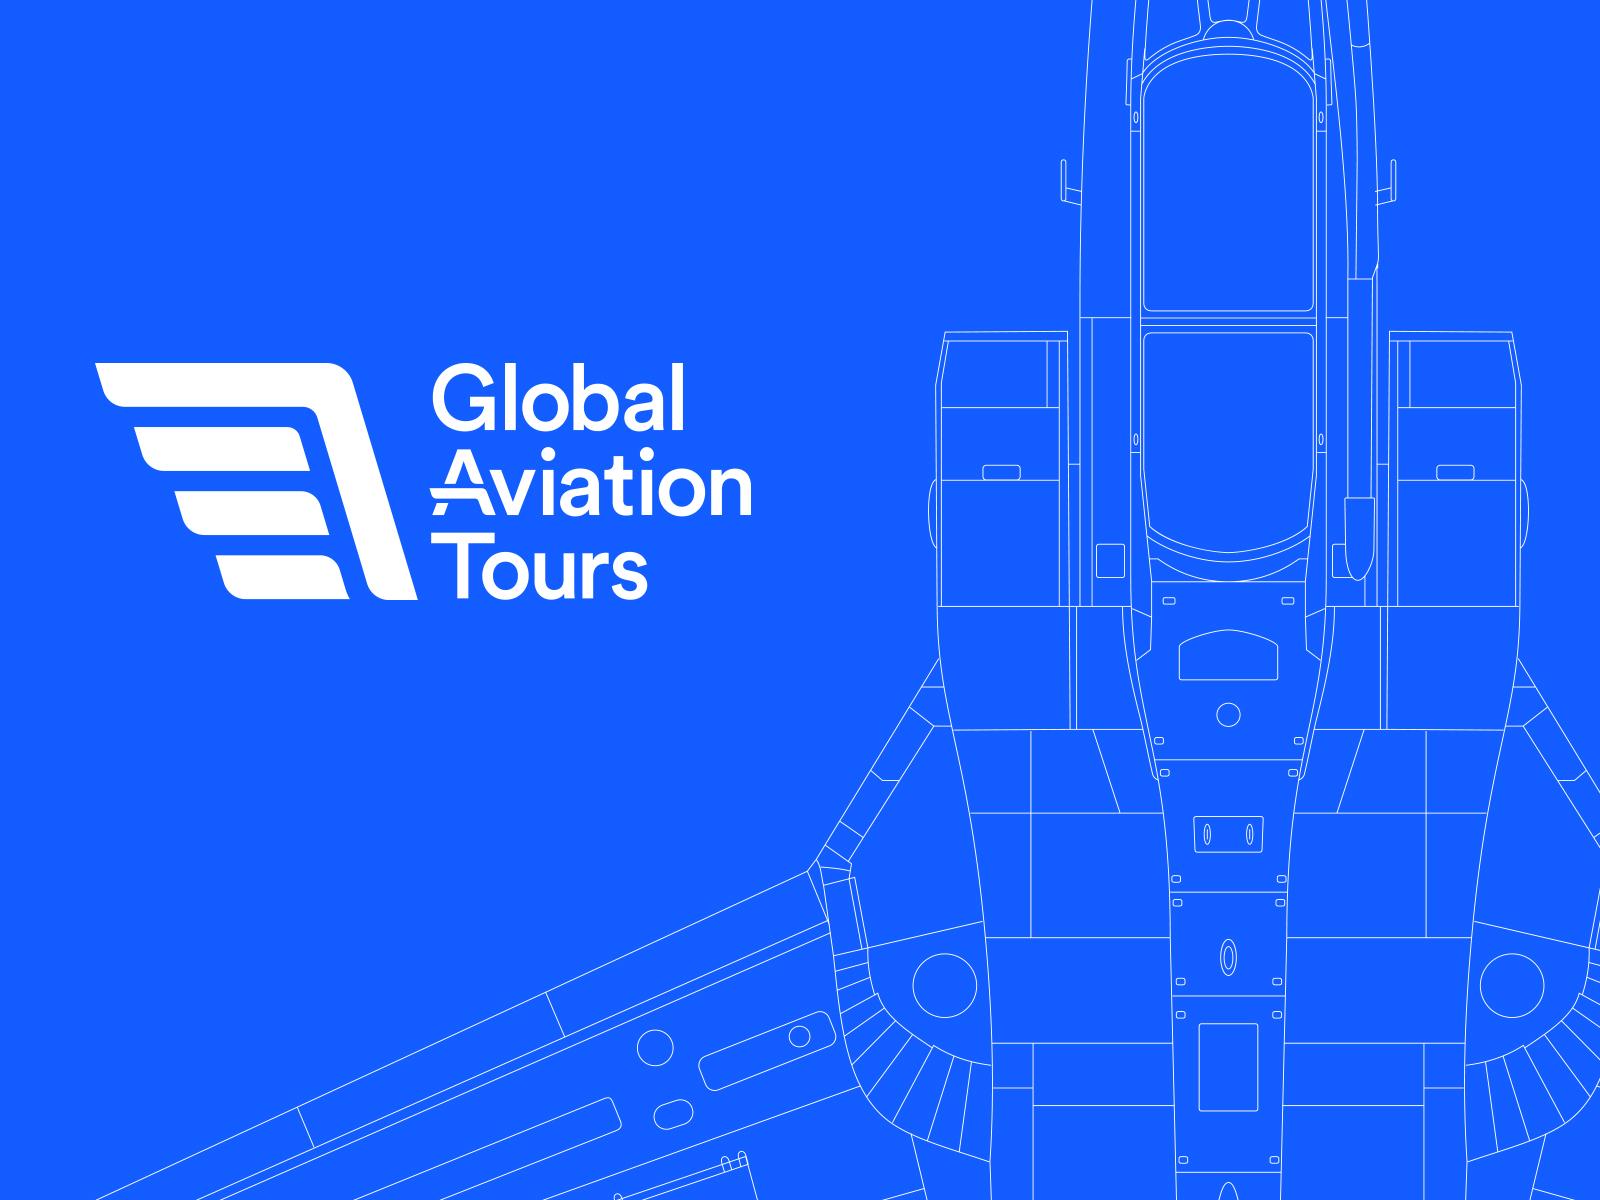 Global Aviation Tours - Branding